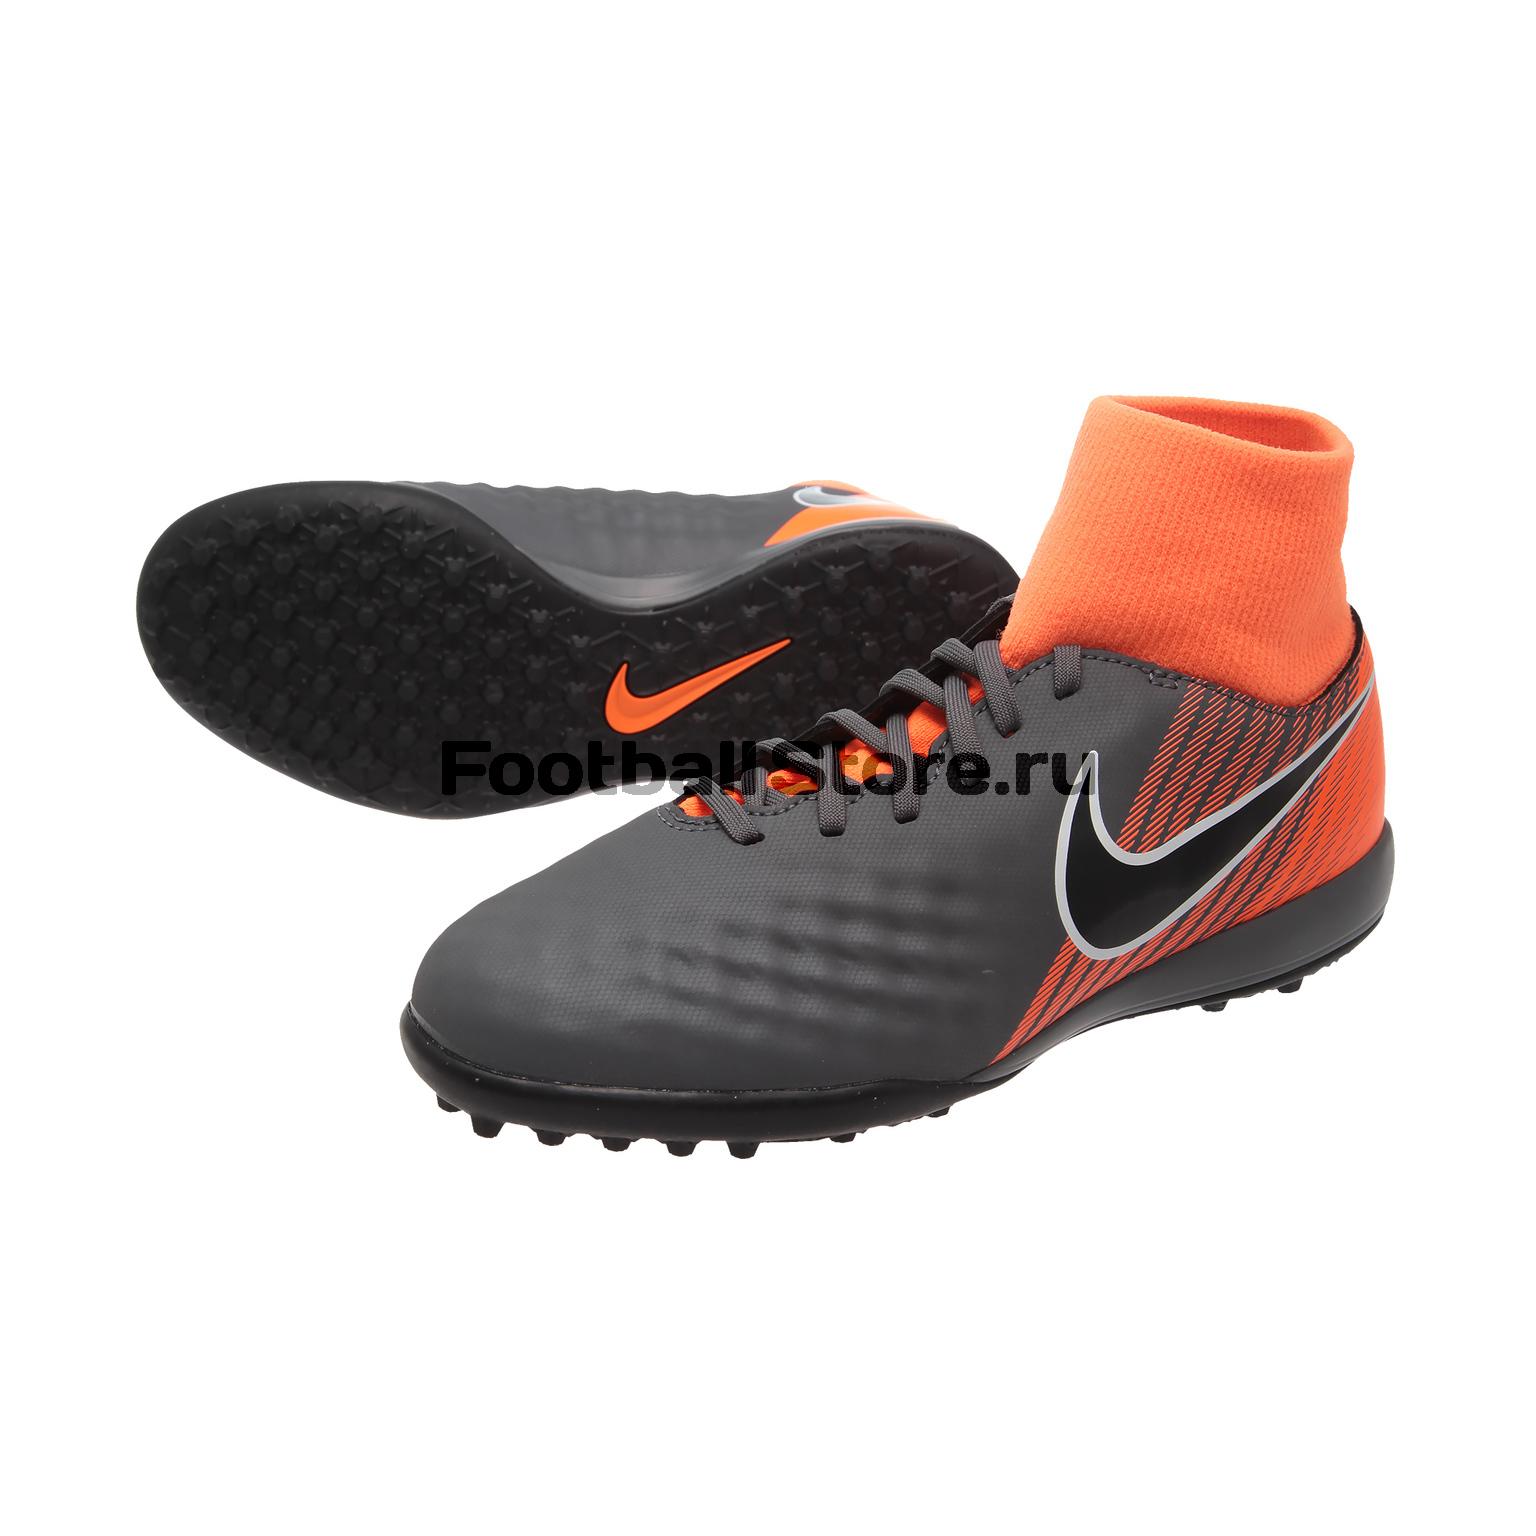 Шиповки Nike JR ObraX 2 Academy DF TF AH7318-080 детские бутсы nike бутсы nike jr phantom 3 elite df fg ah7292 081